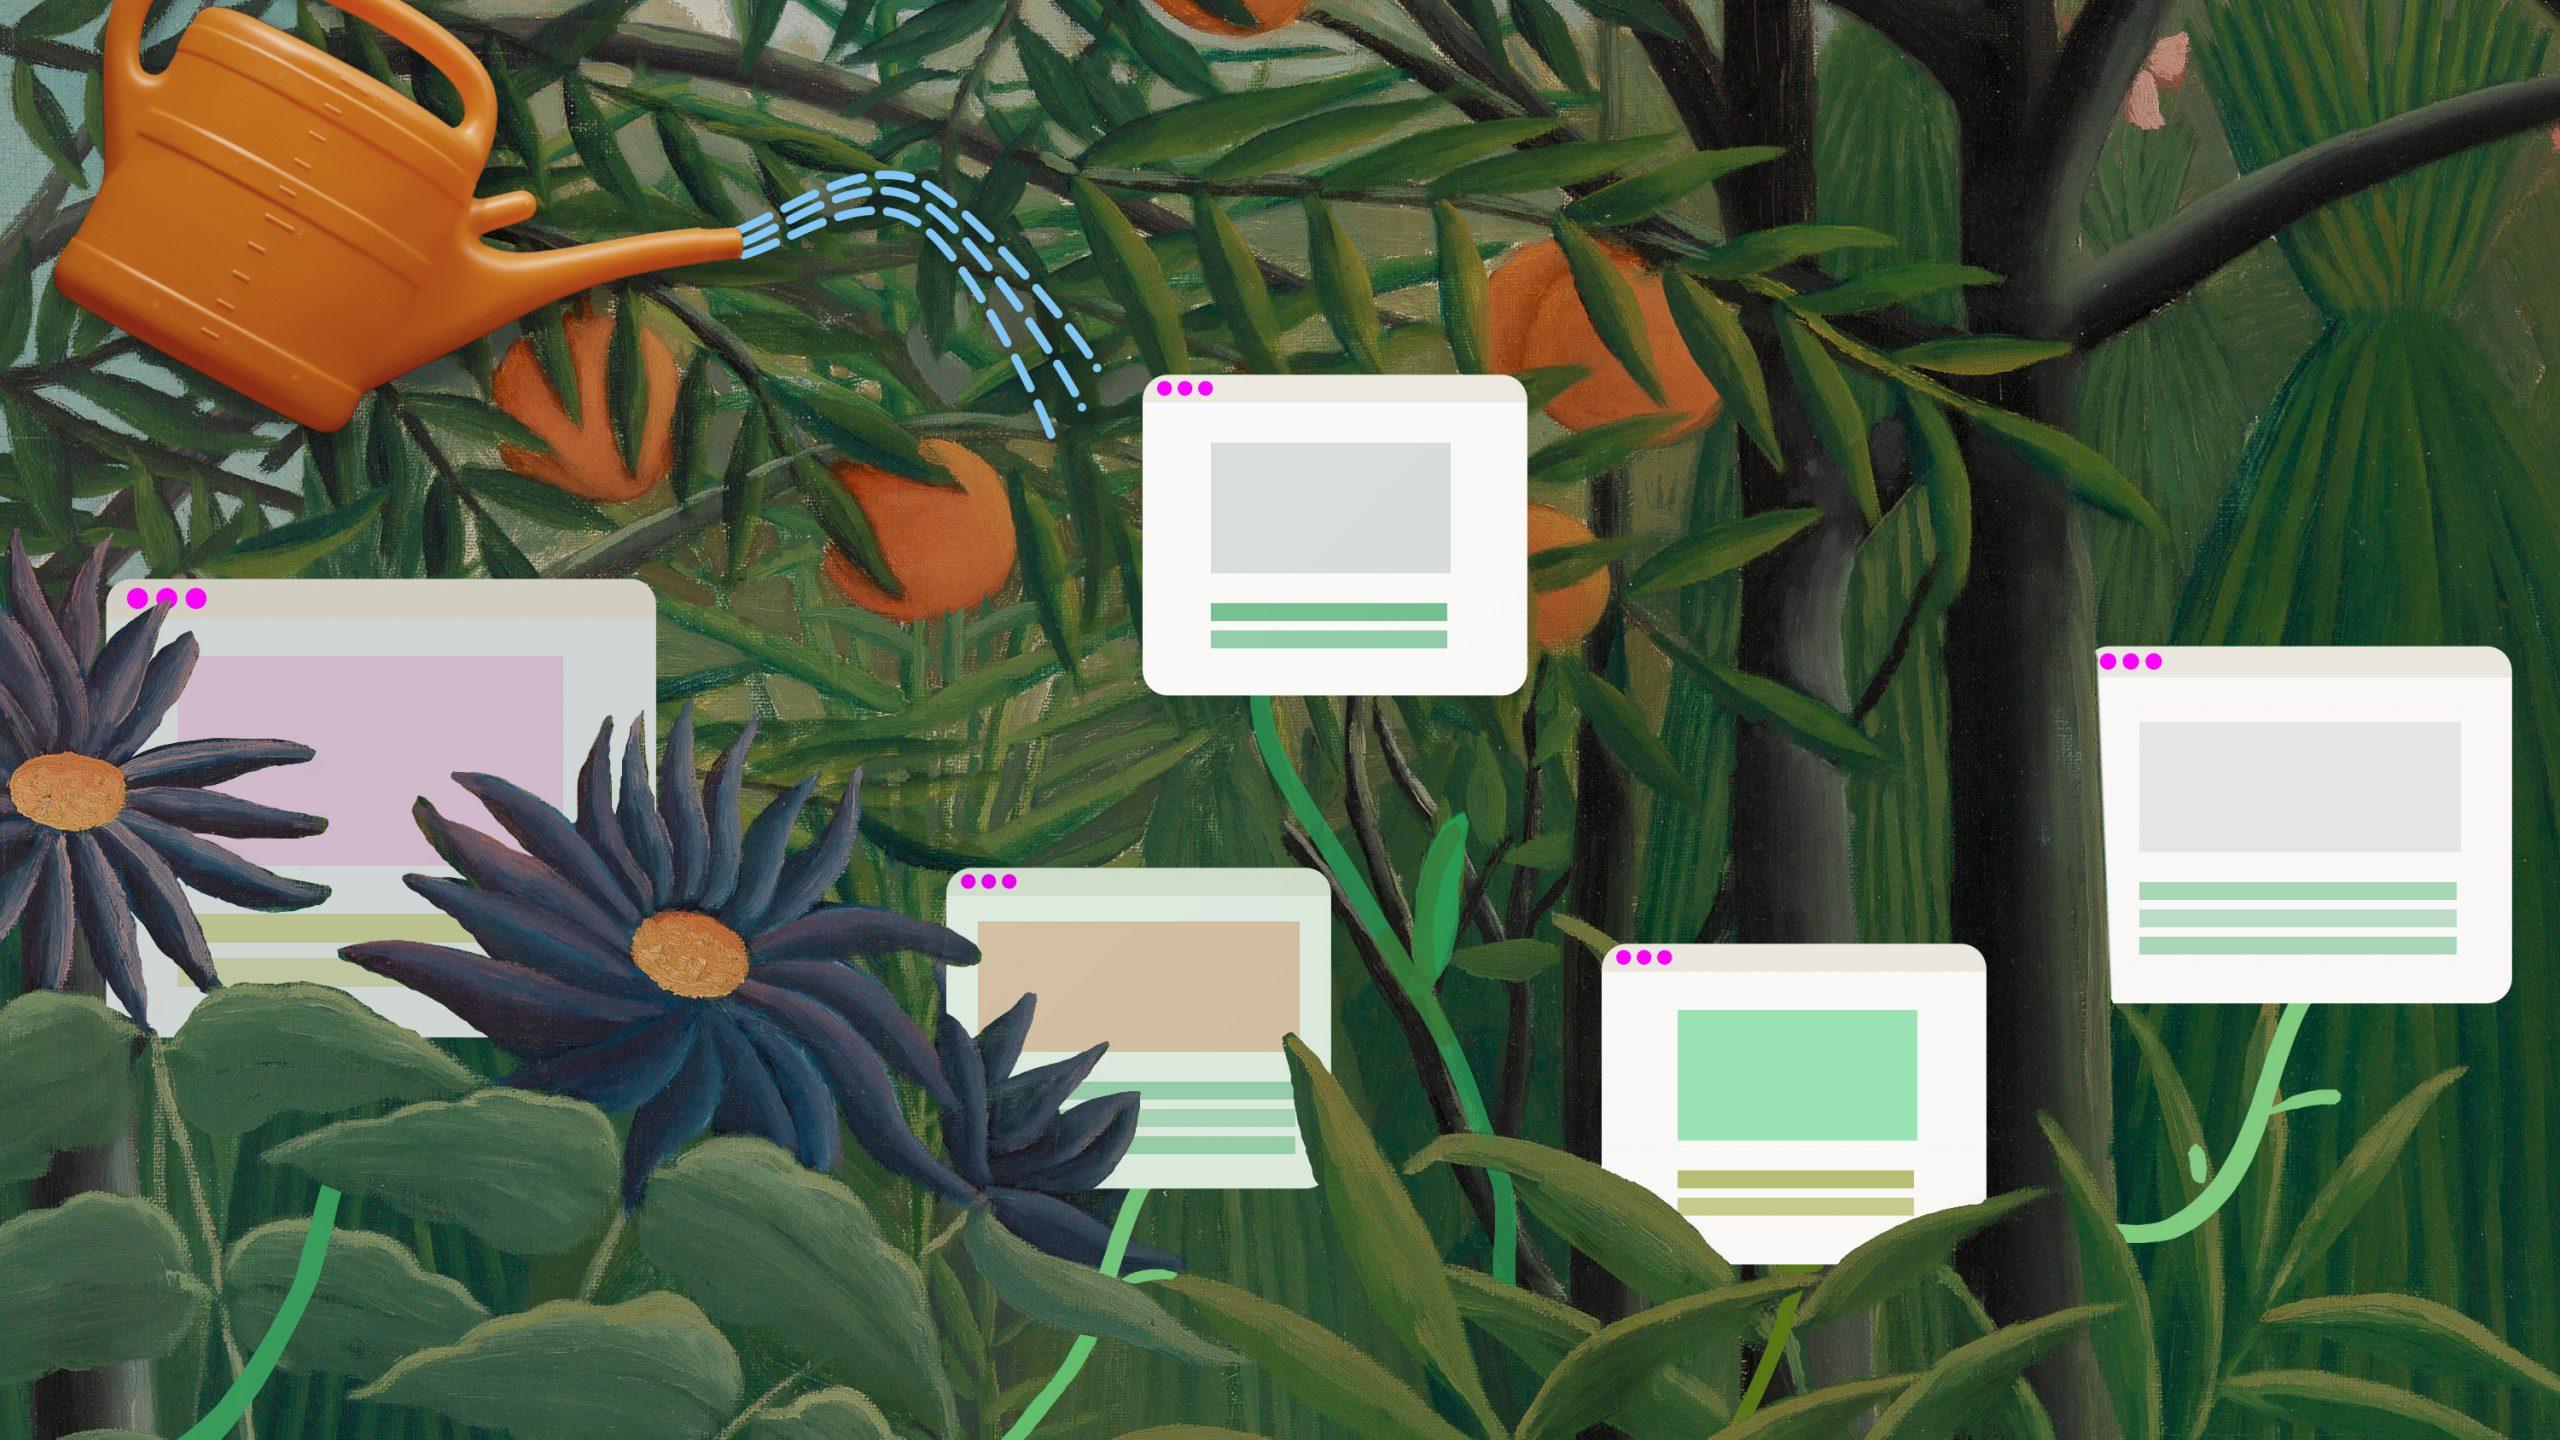 SNS全盛の時代に 「デジタル・ガーデン」が 静かなブーム